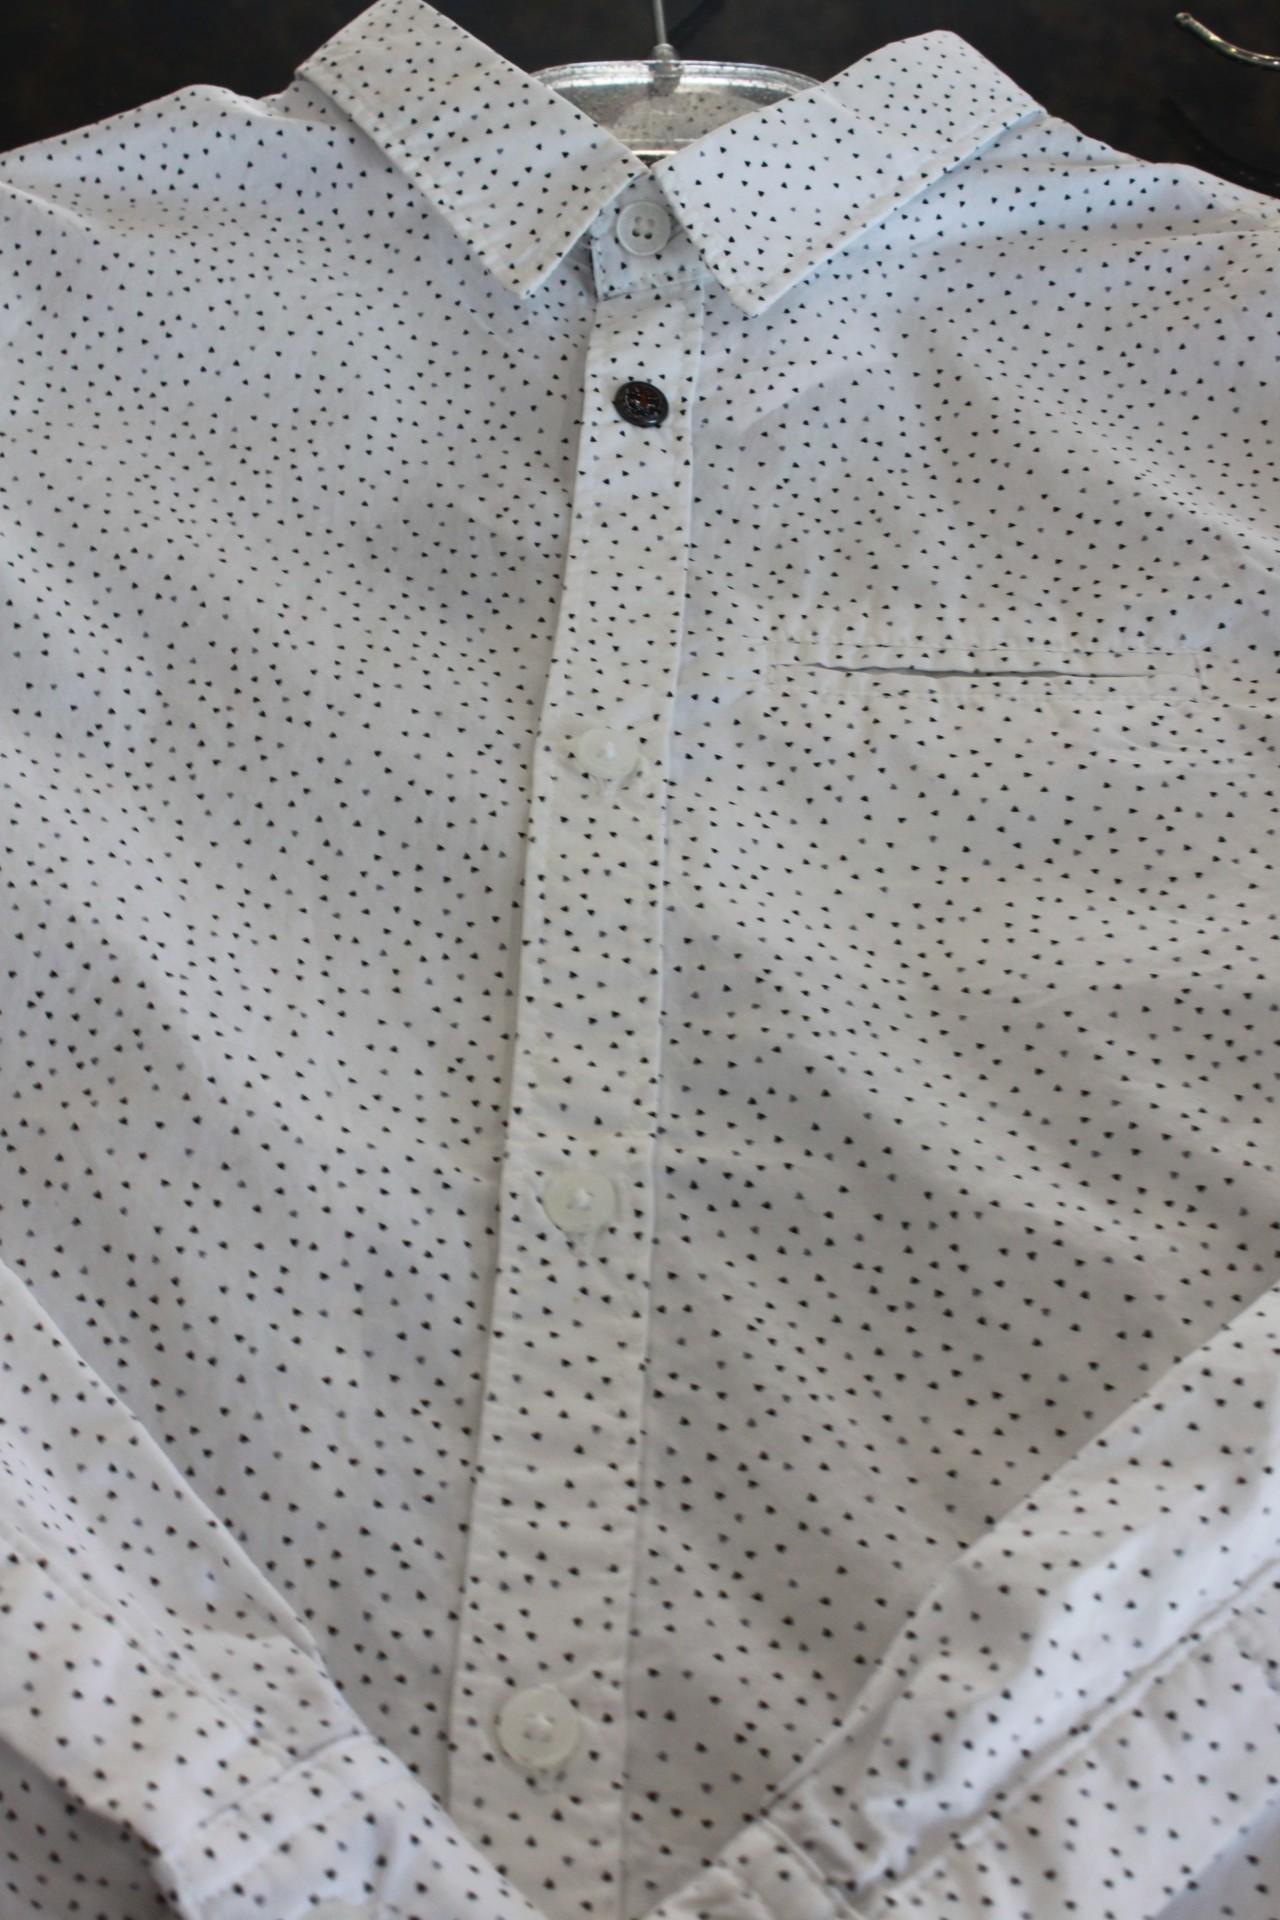 Camisa branca com motivos pretos Ikks